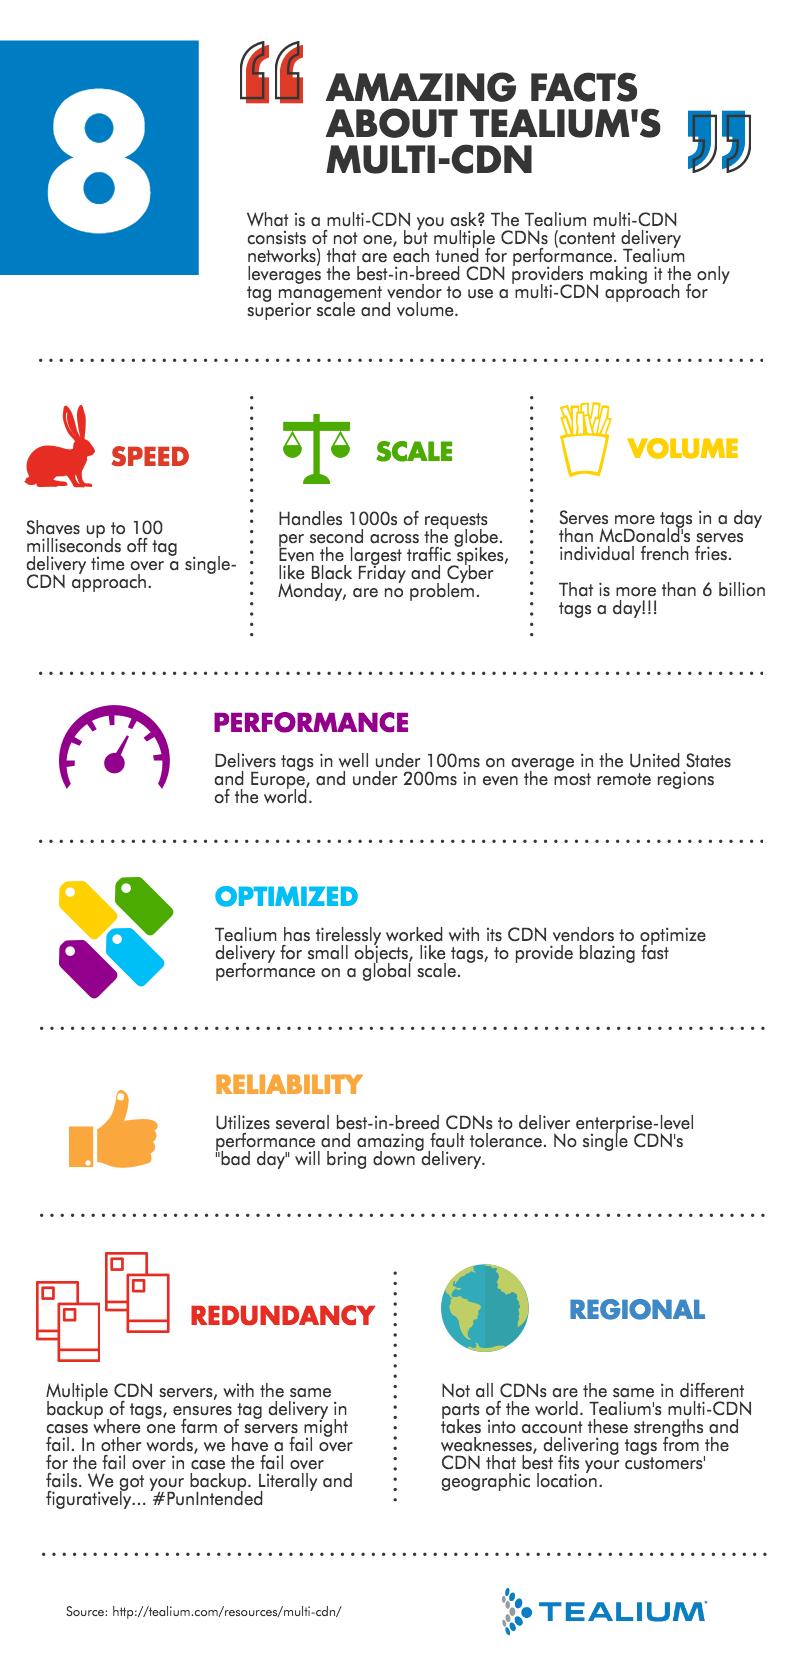 8 Amazing Facts about Tealium's Multi-CDN